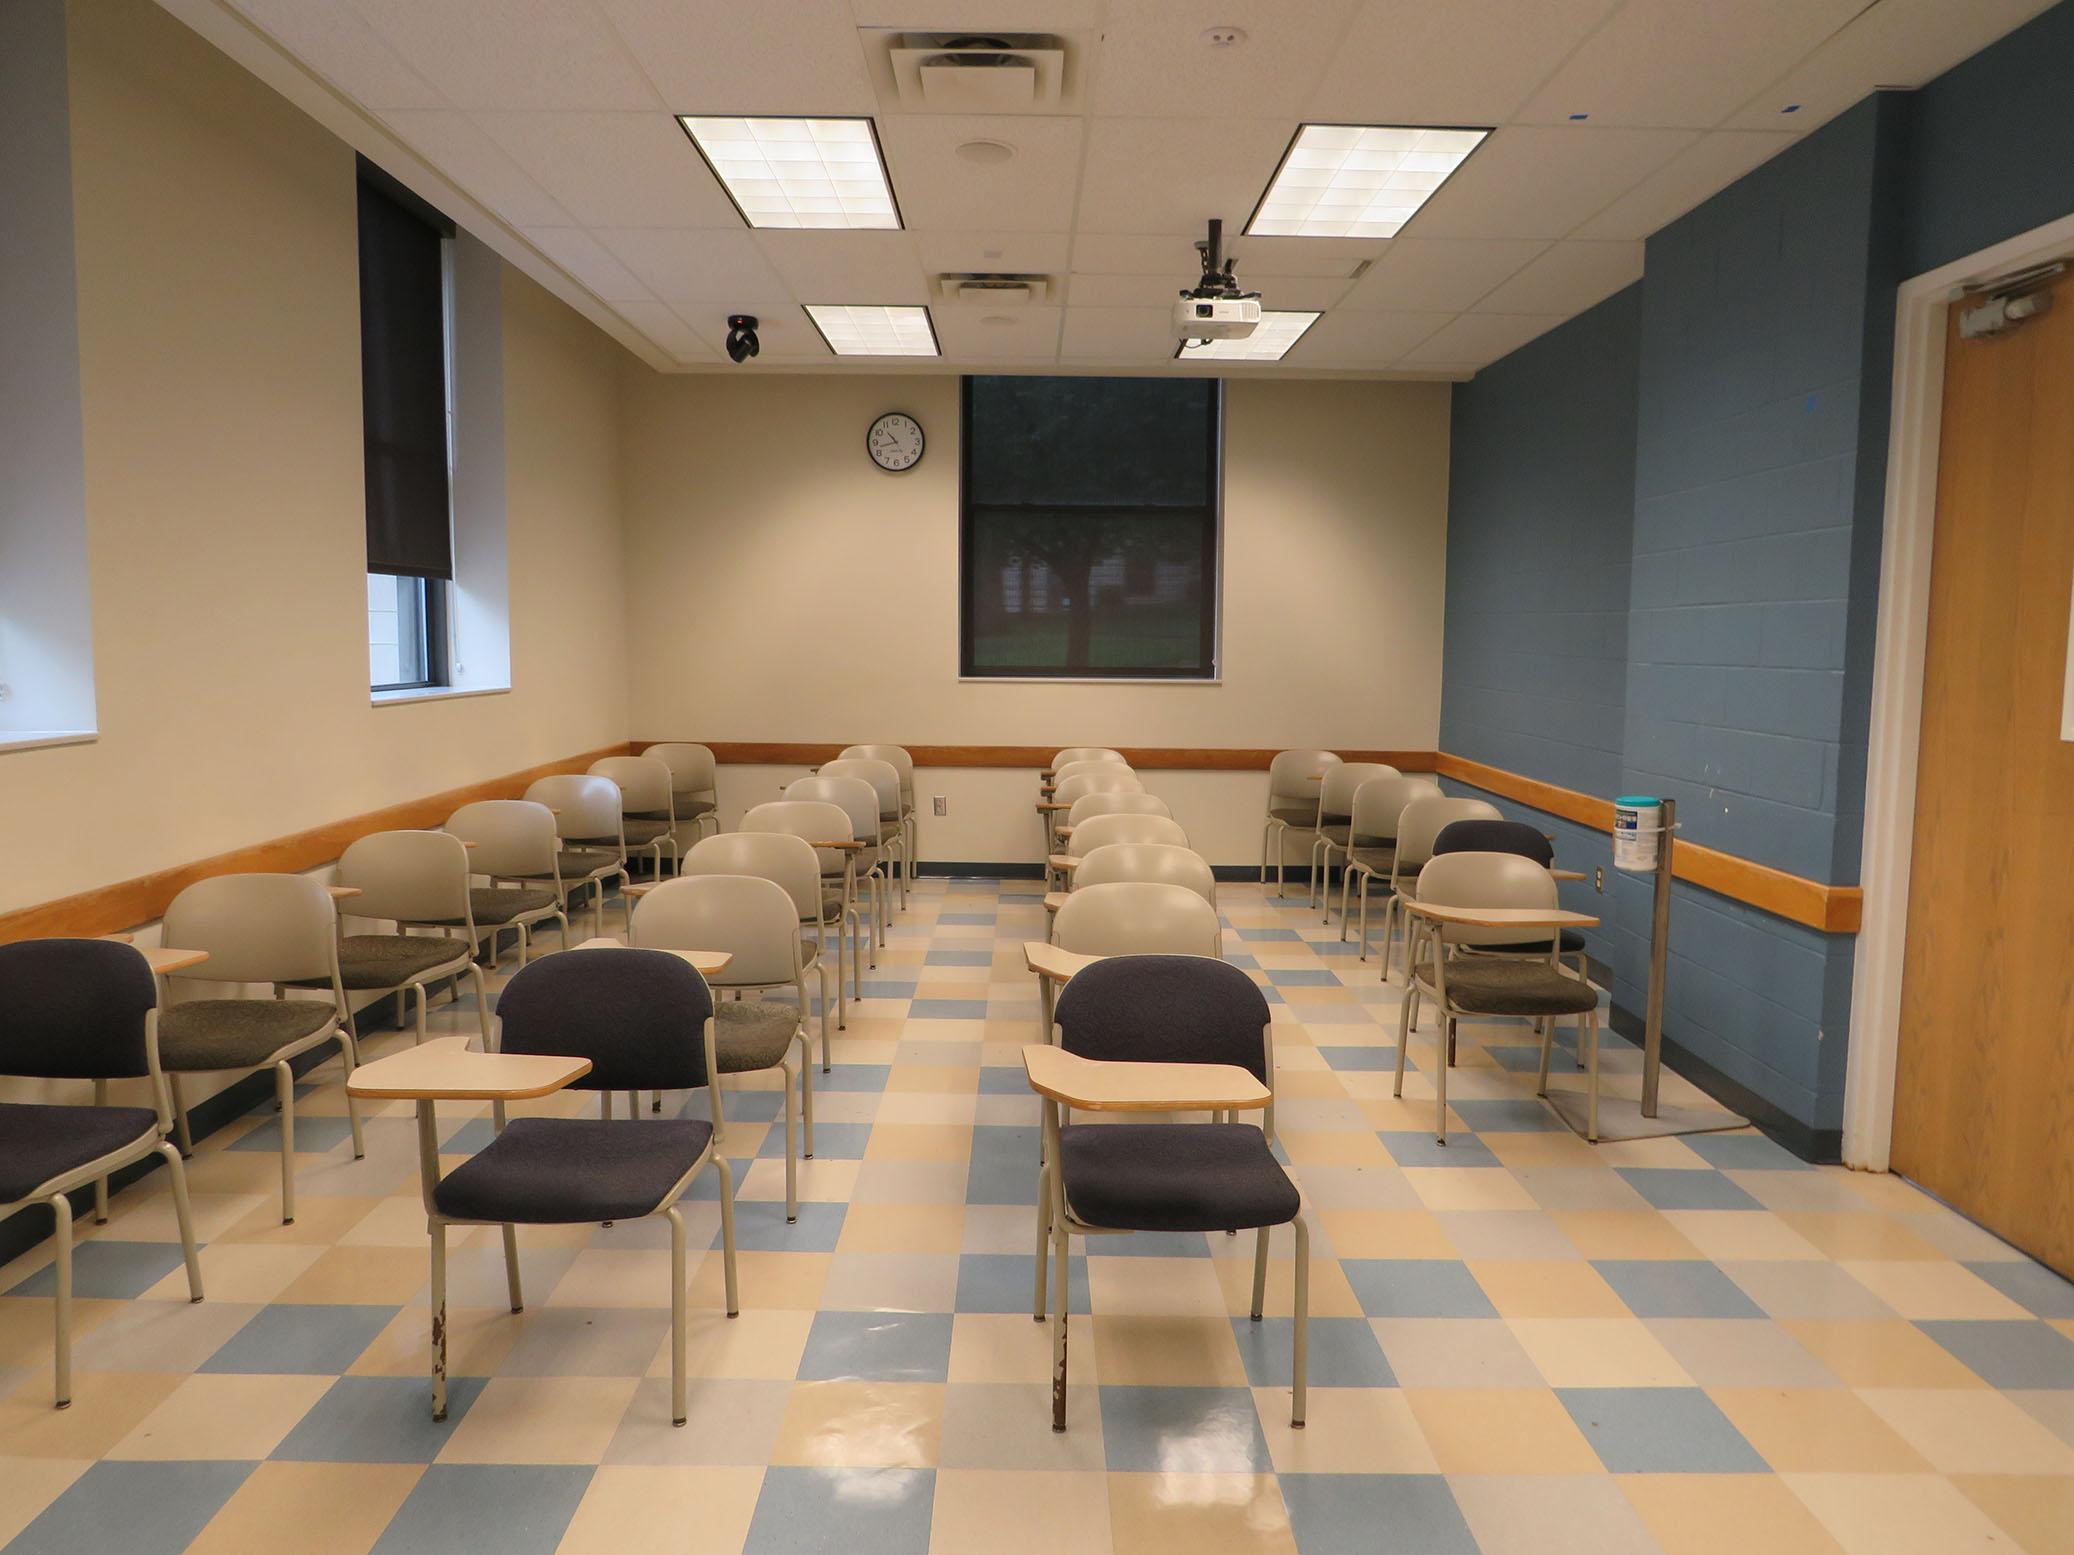 Lazenby Hall Room 001